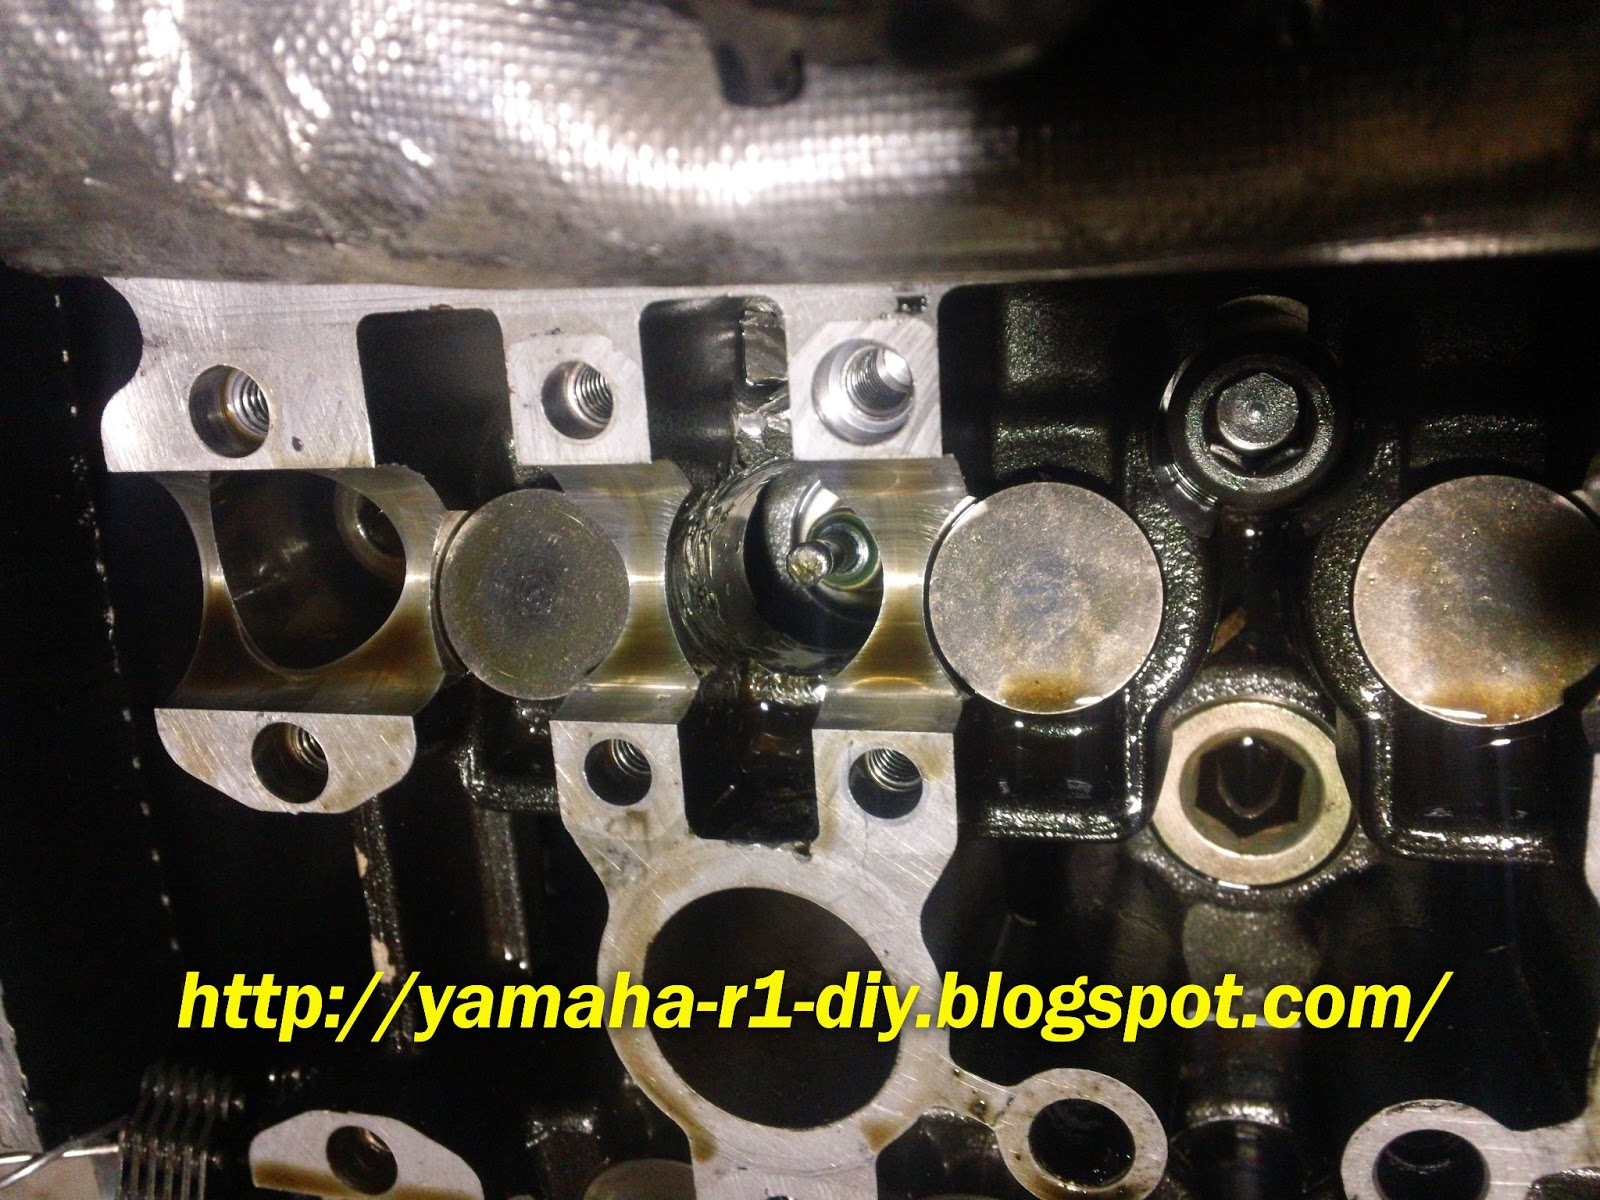 100+ Yamaha Oil Injection Problems – yasminroohi